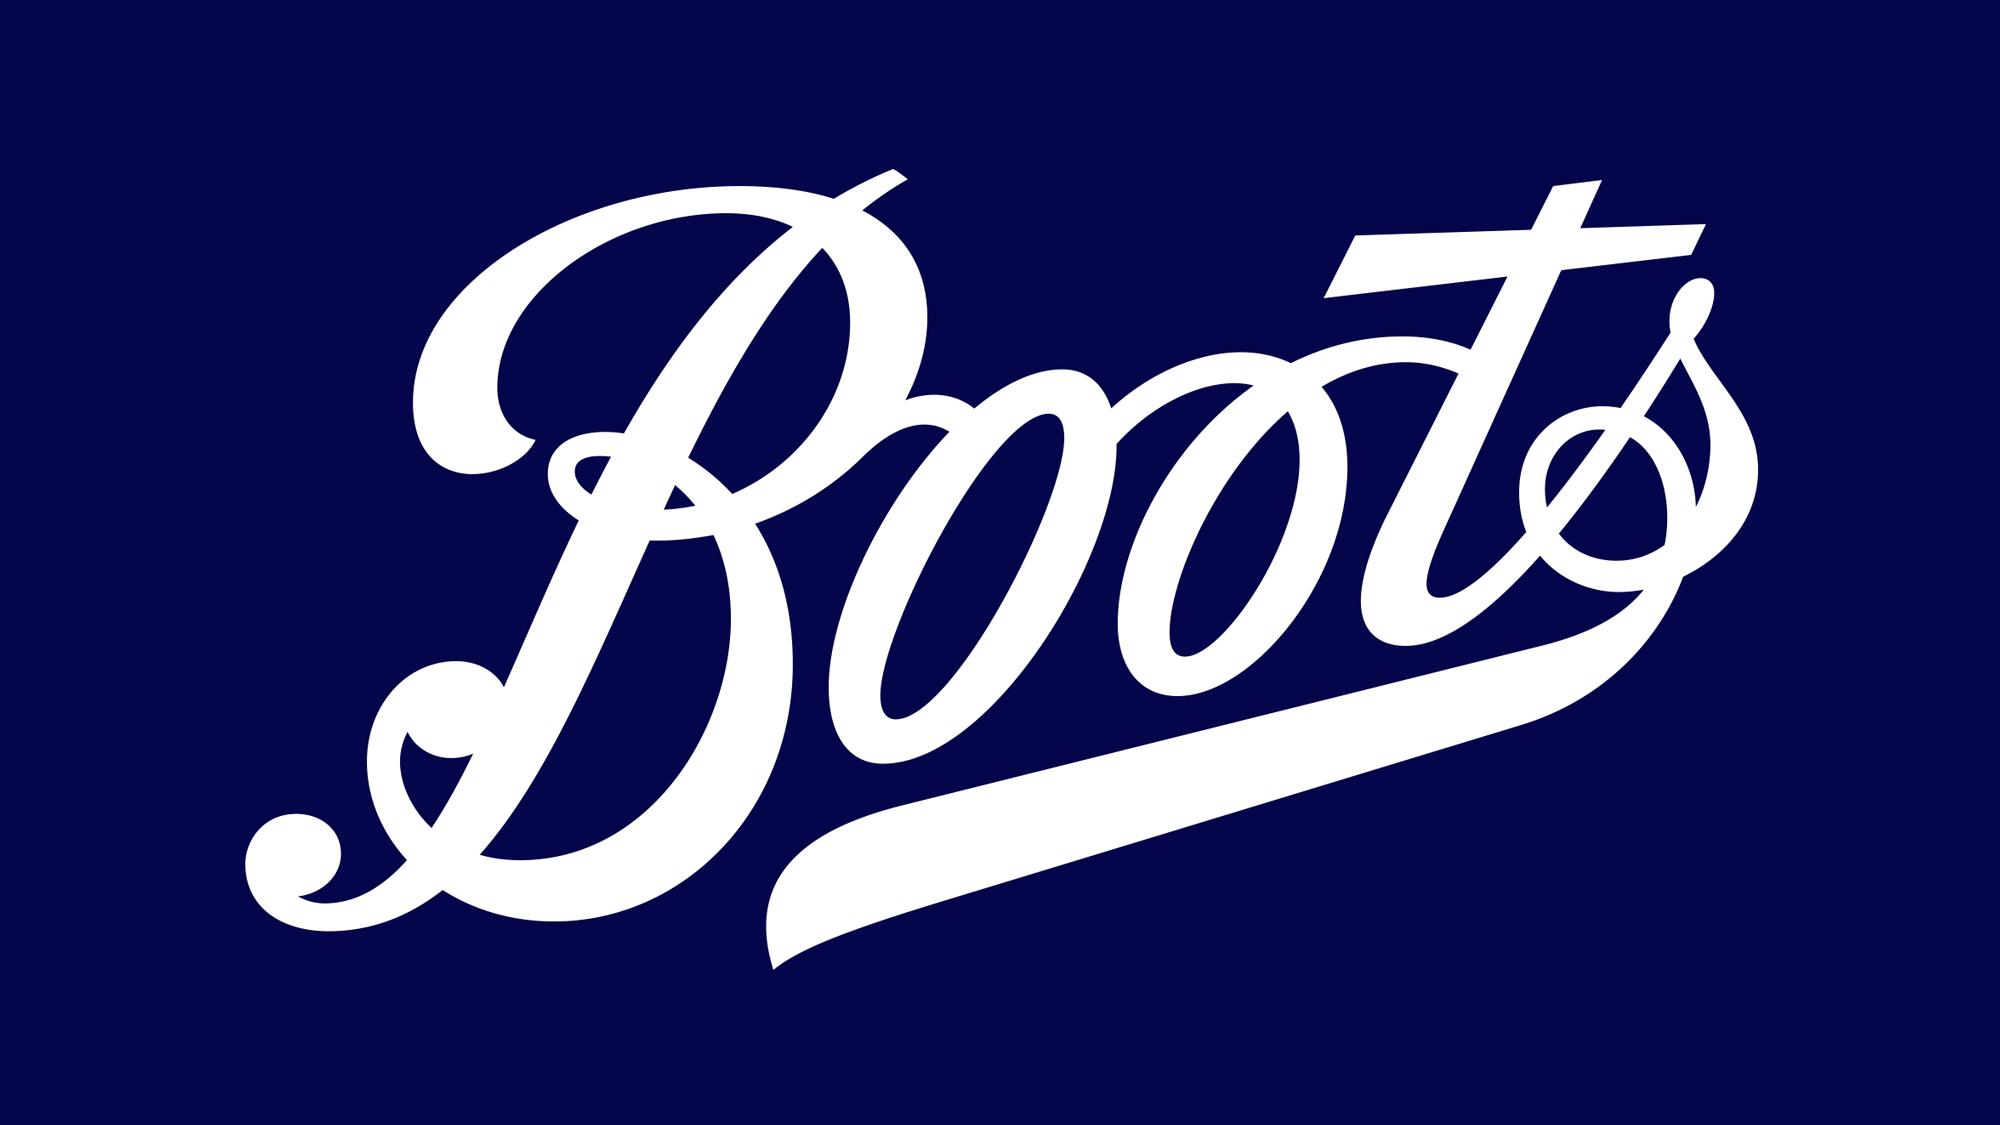 Boots reveals biggest logo redesign in